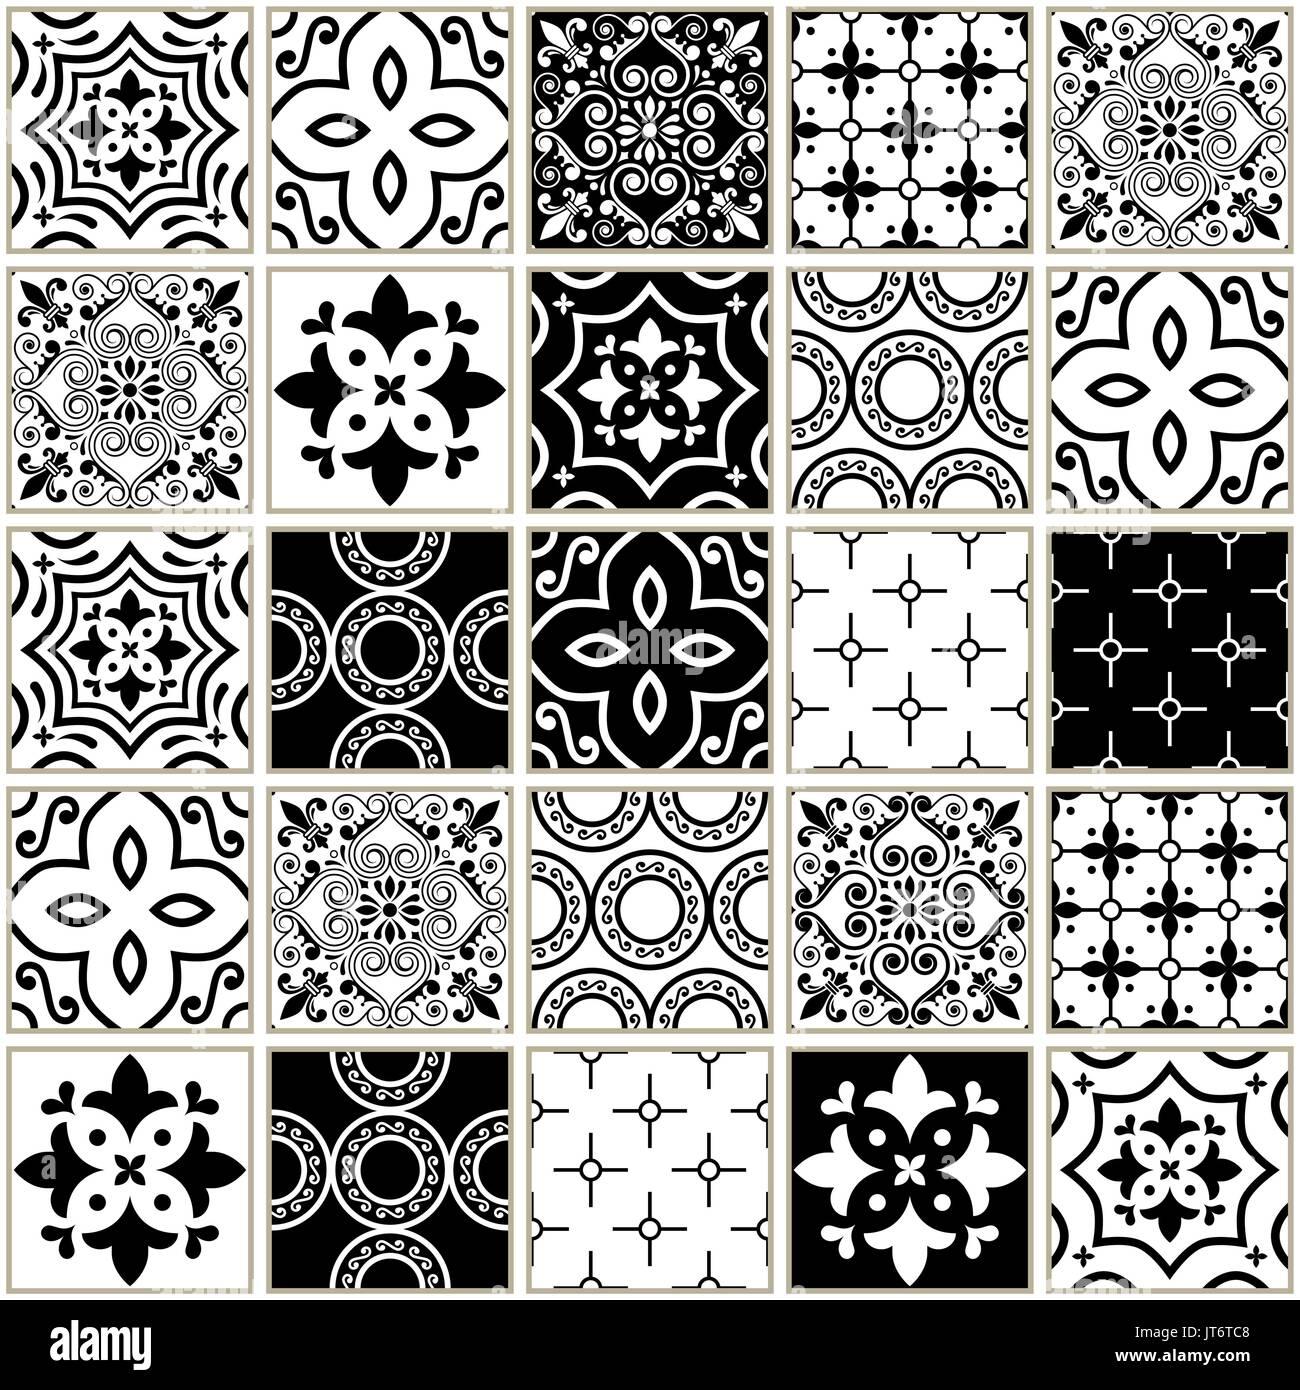 Veector navy blue tiles pattern, Azulejos - Portuguese seamless tile design, monochrome ceramics set - Stock Vector